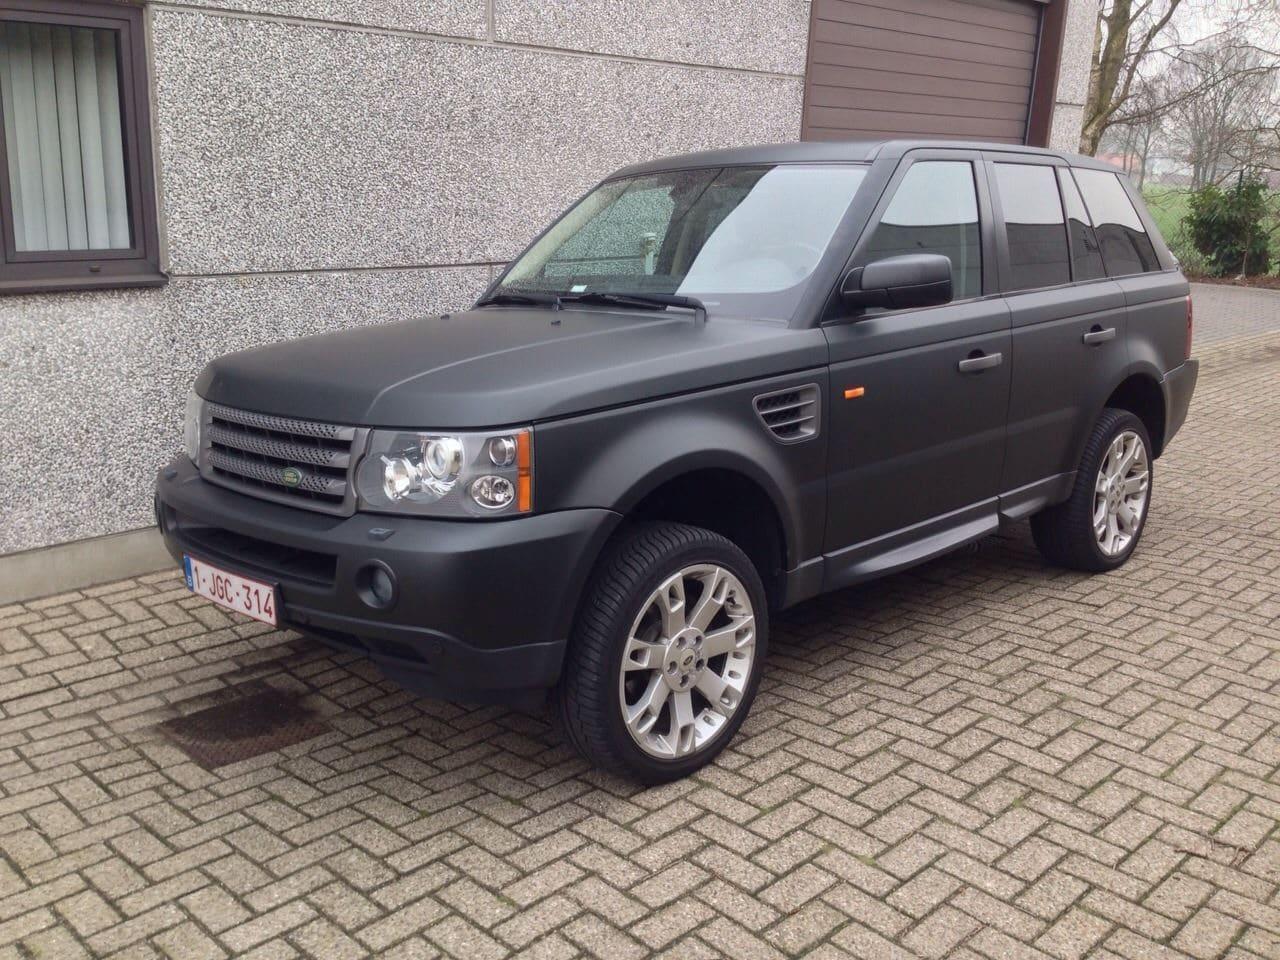 Range Rover Sport Matte >> Range Rover Sport met Mat Zwarte Wrap | Wrap My Ride